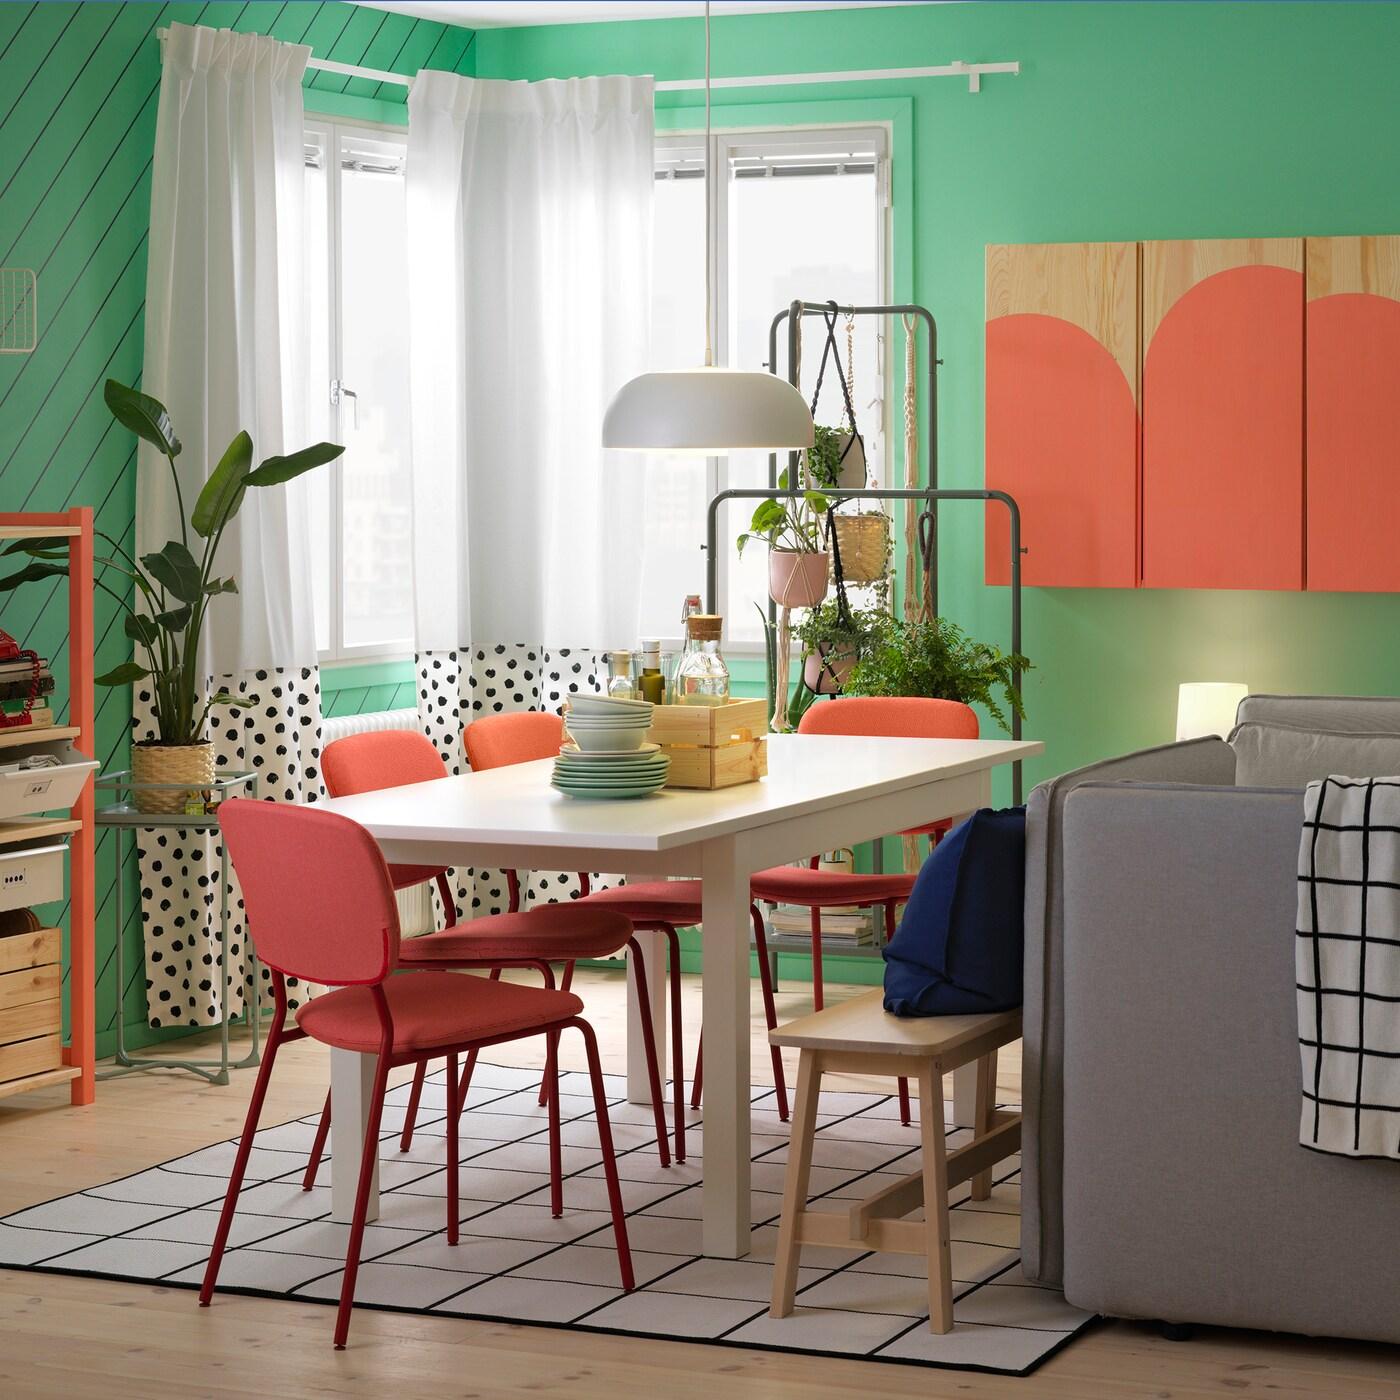 Ikea Dining Room Ideas: Dining Gallery